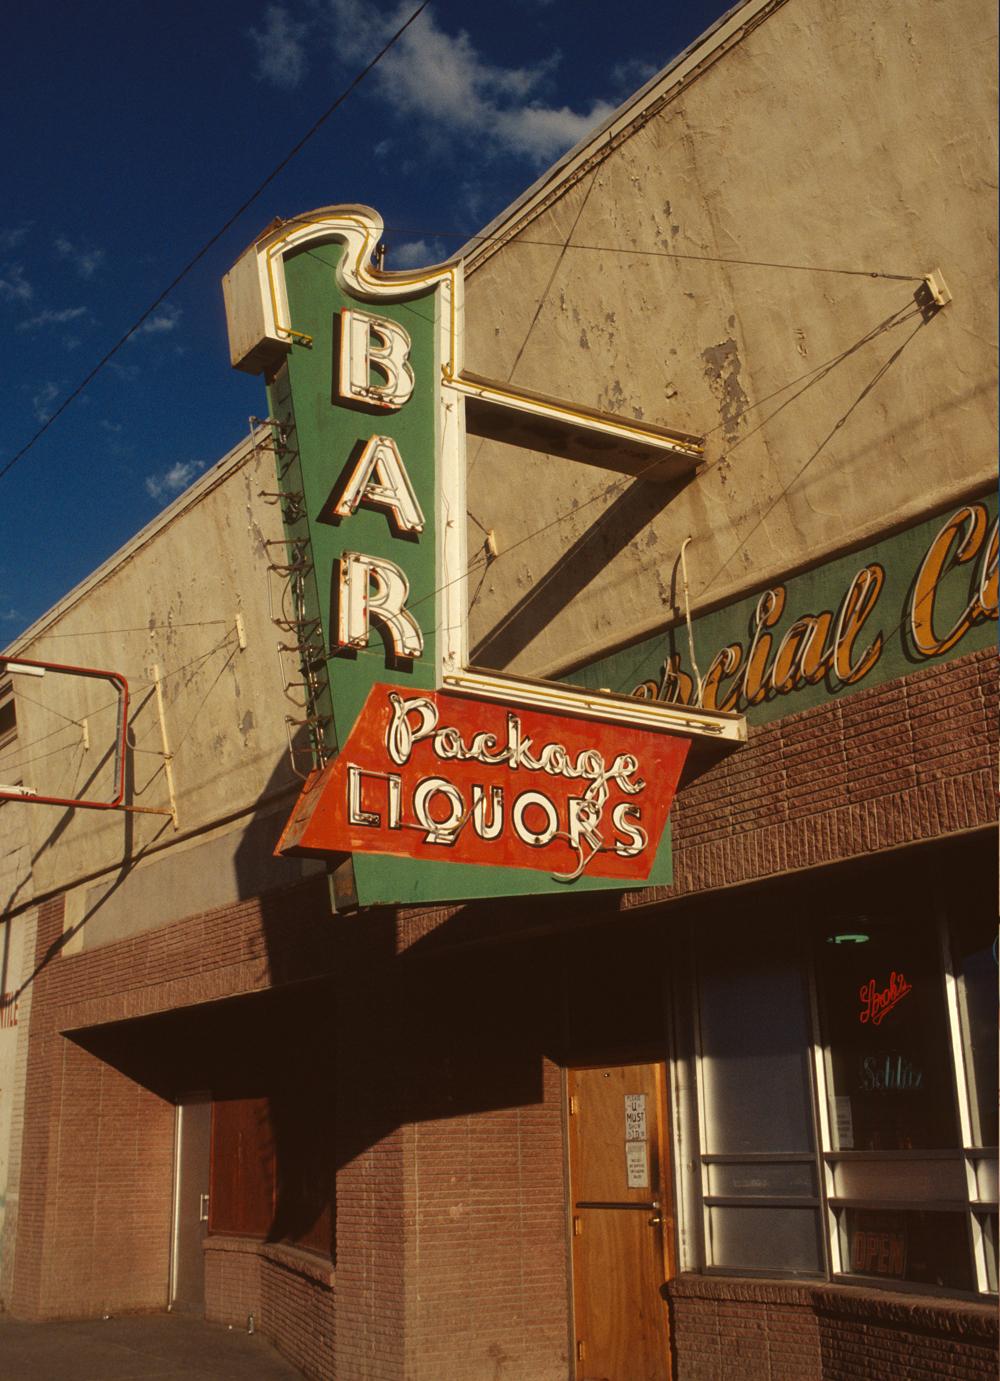 Bar, photographed in Colorado